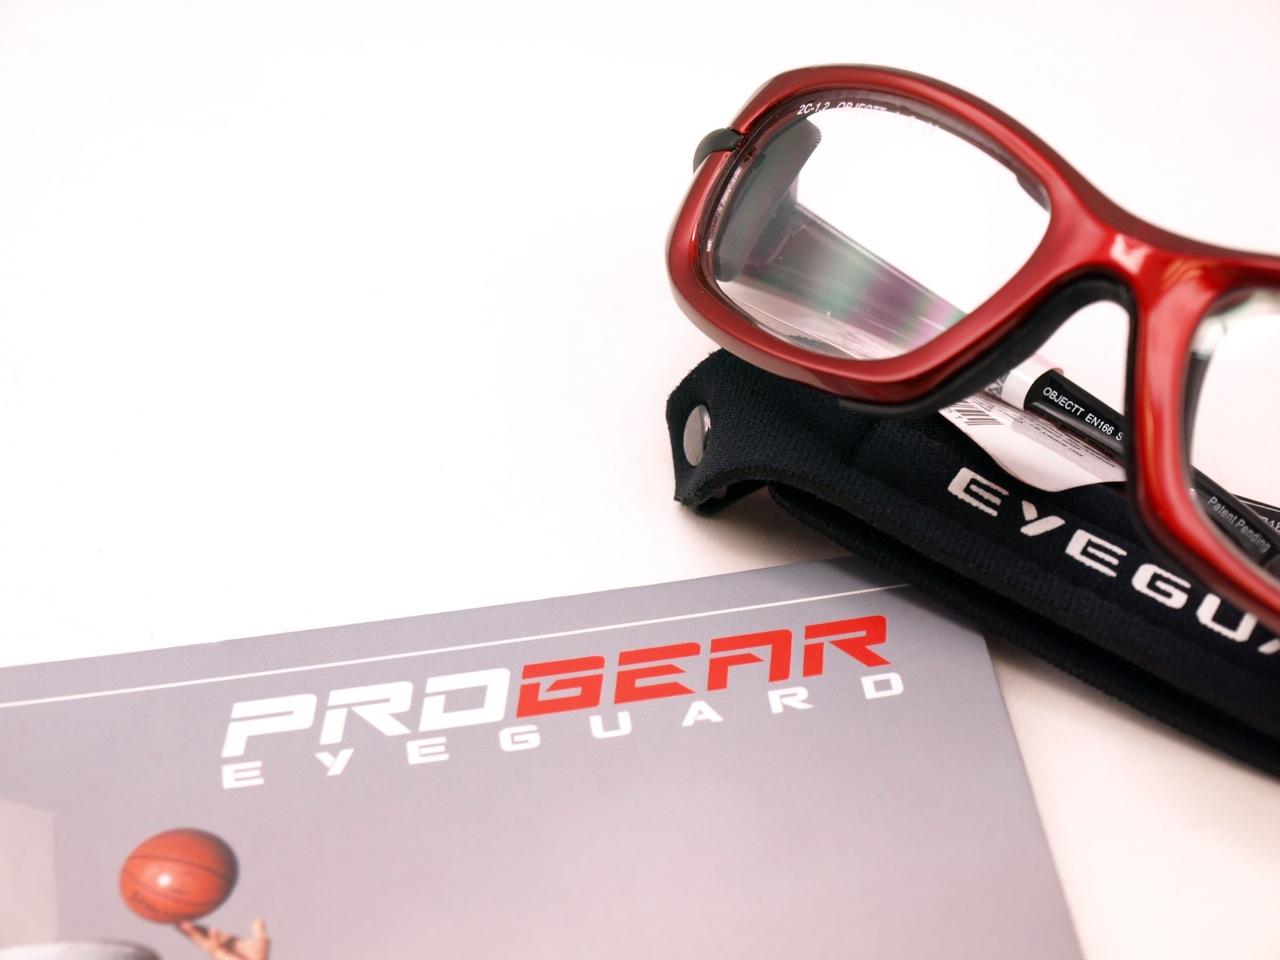 Progear - sport goggles